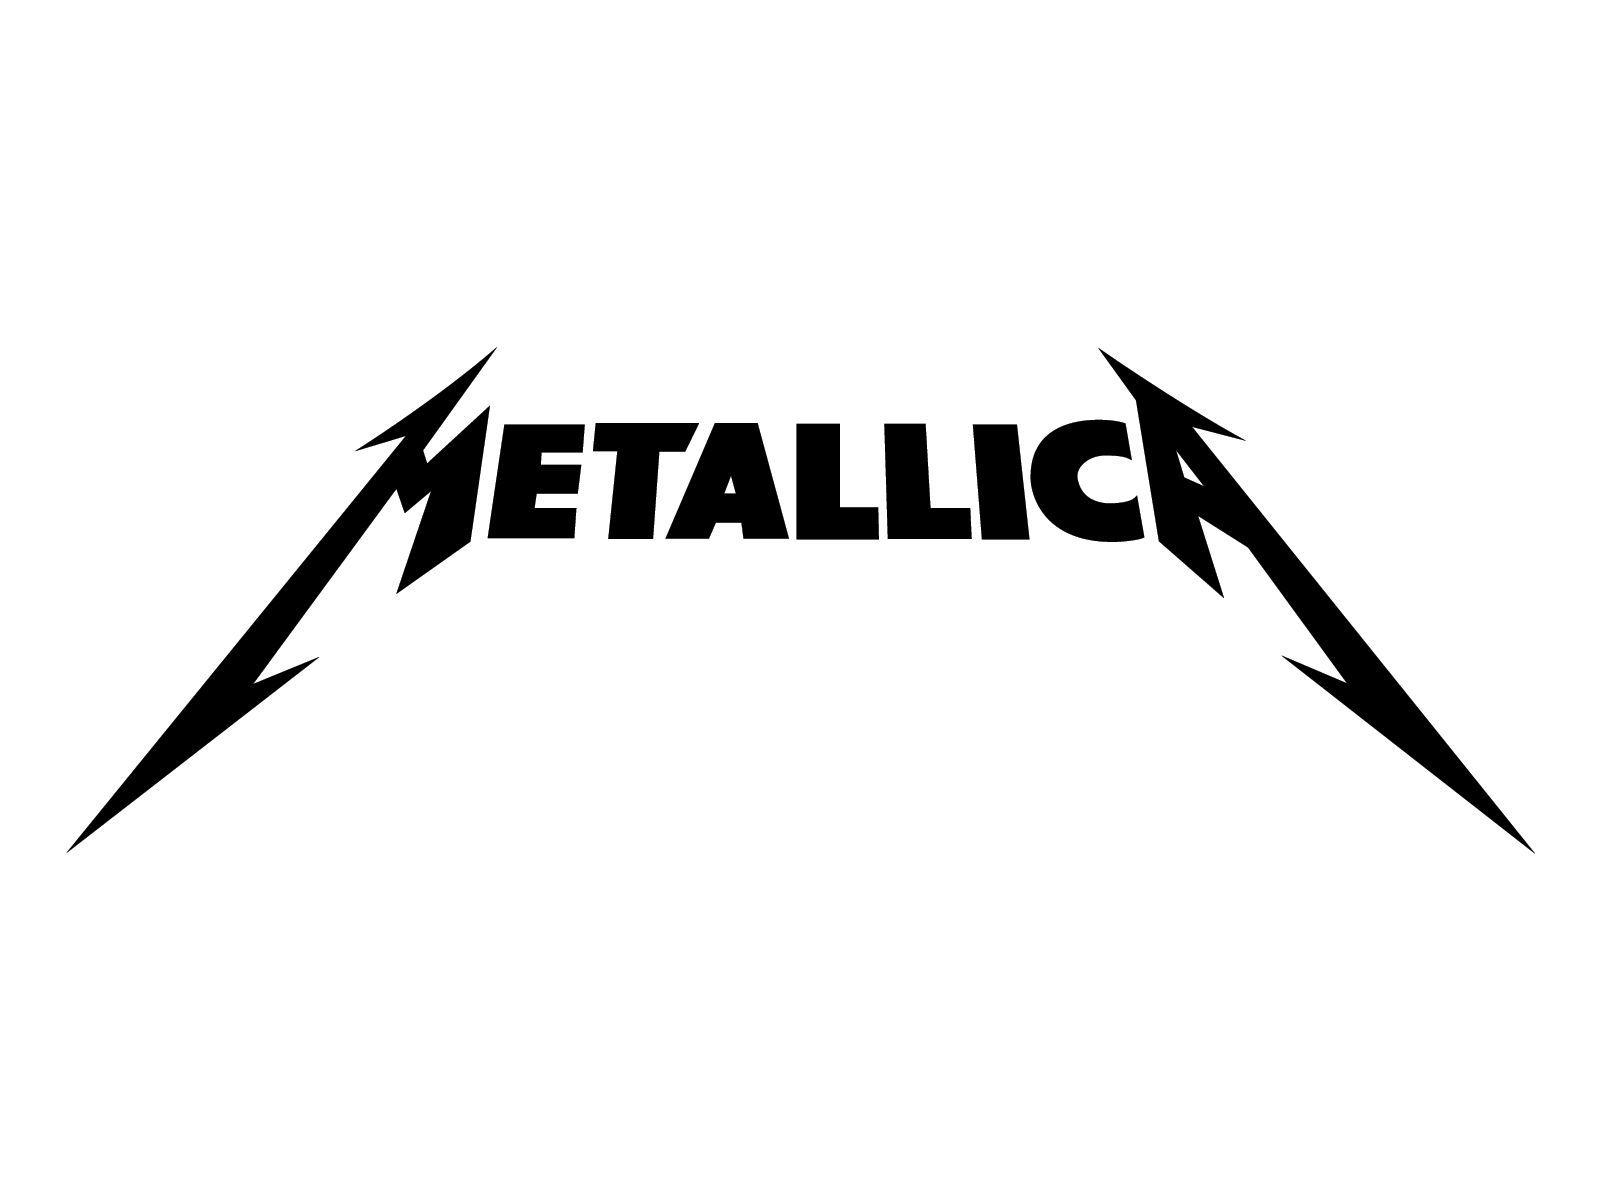 metallica-logo-wallpaper-DjARrUr.jpg